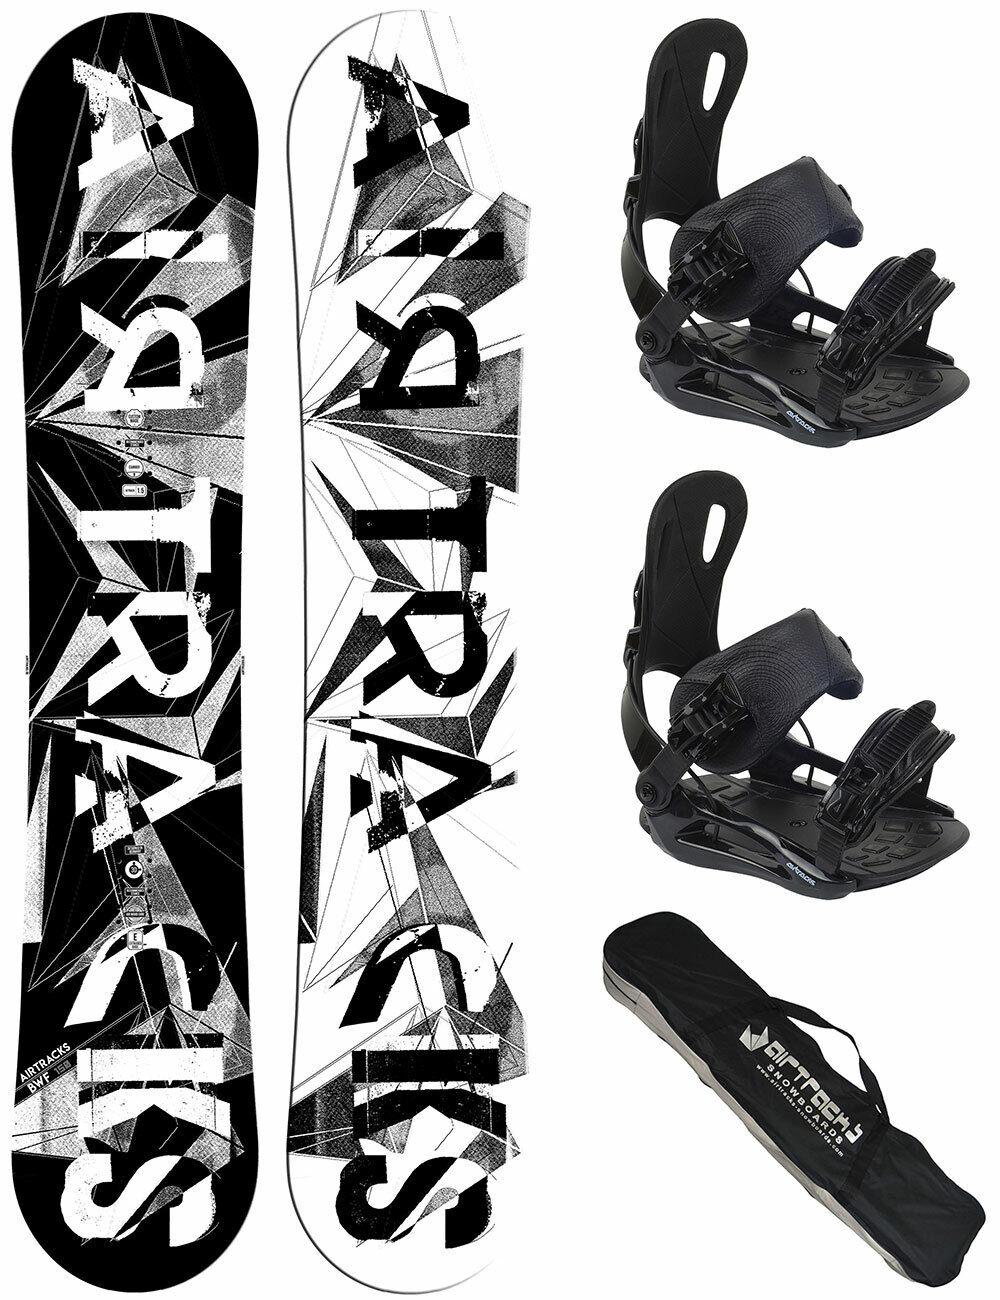 Snowboard Set AIRTRACKS BWF+Bindung Star oder Master+Sb Bag 155 159 161 165 171